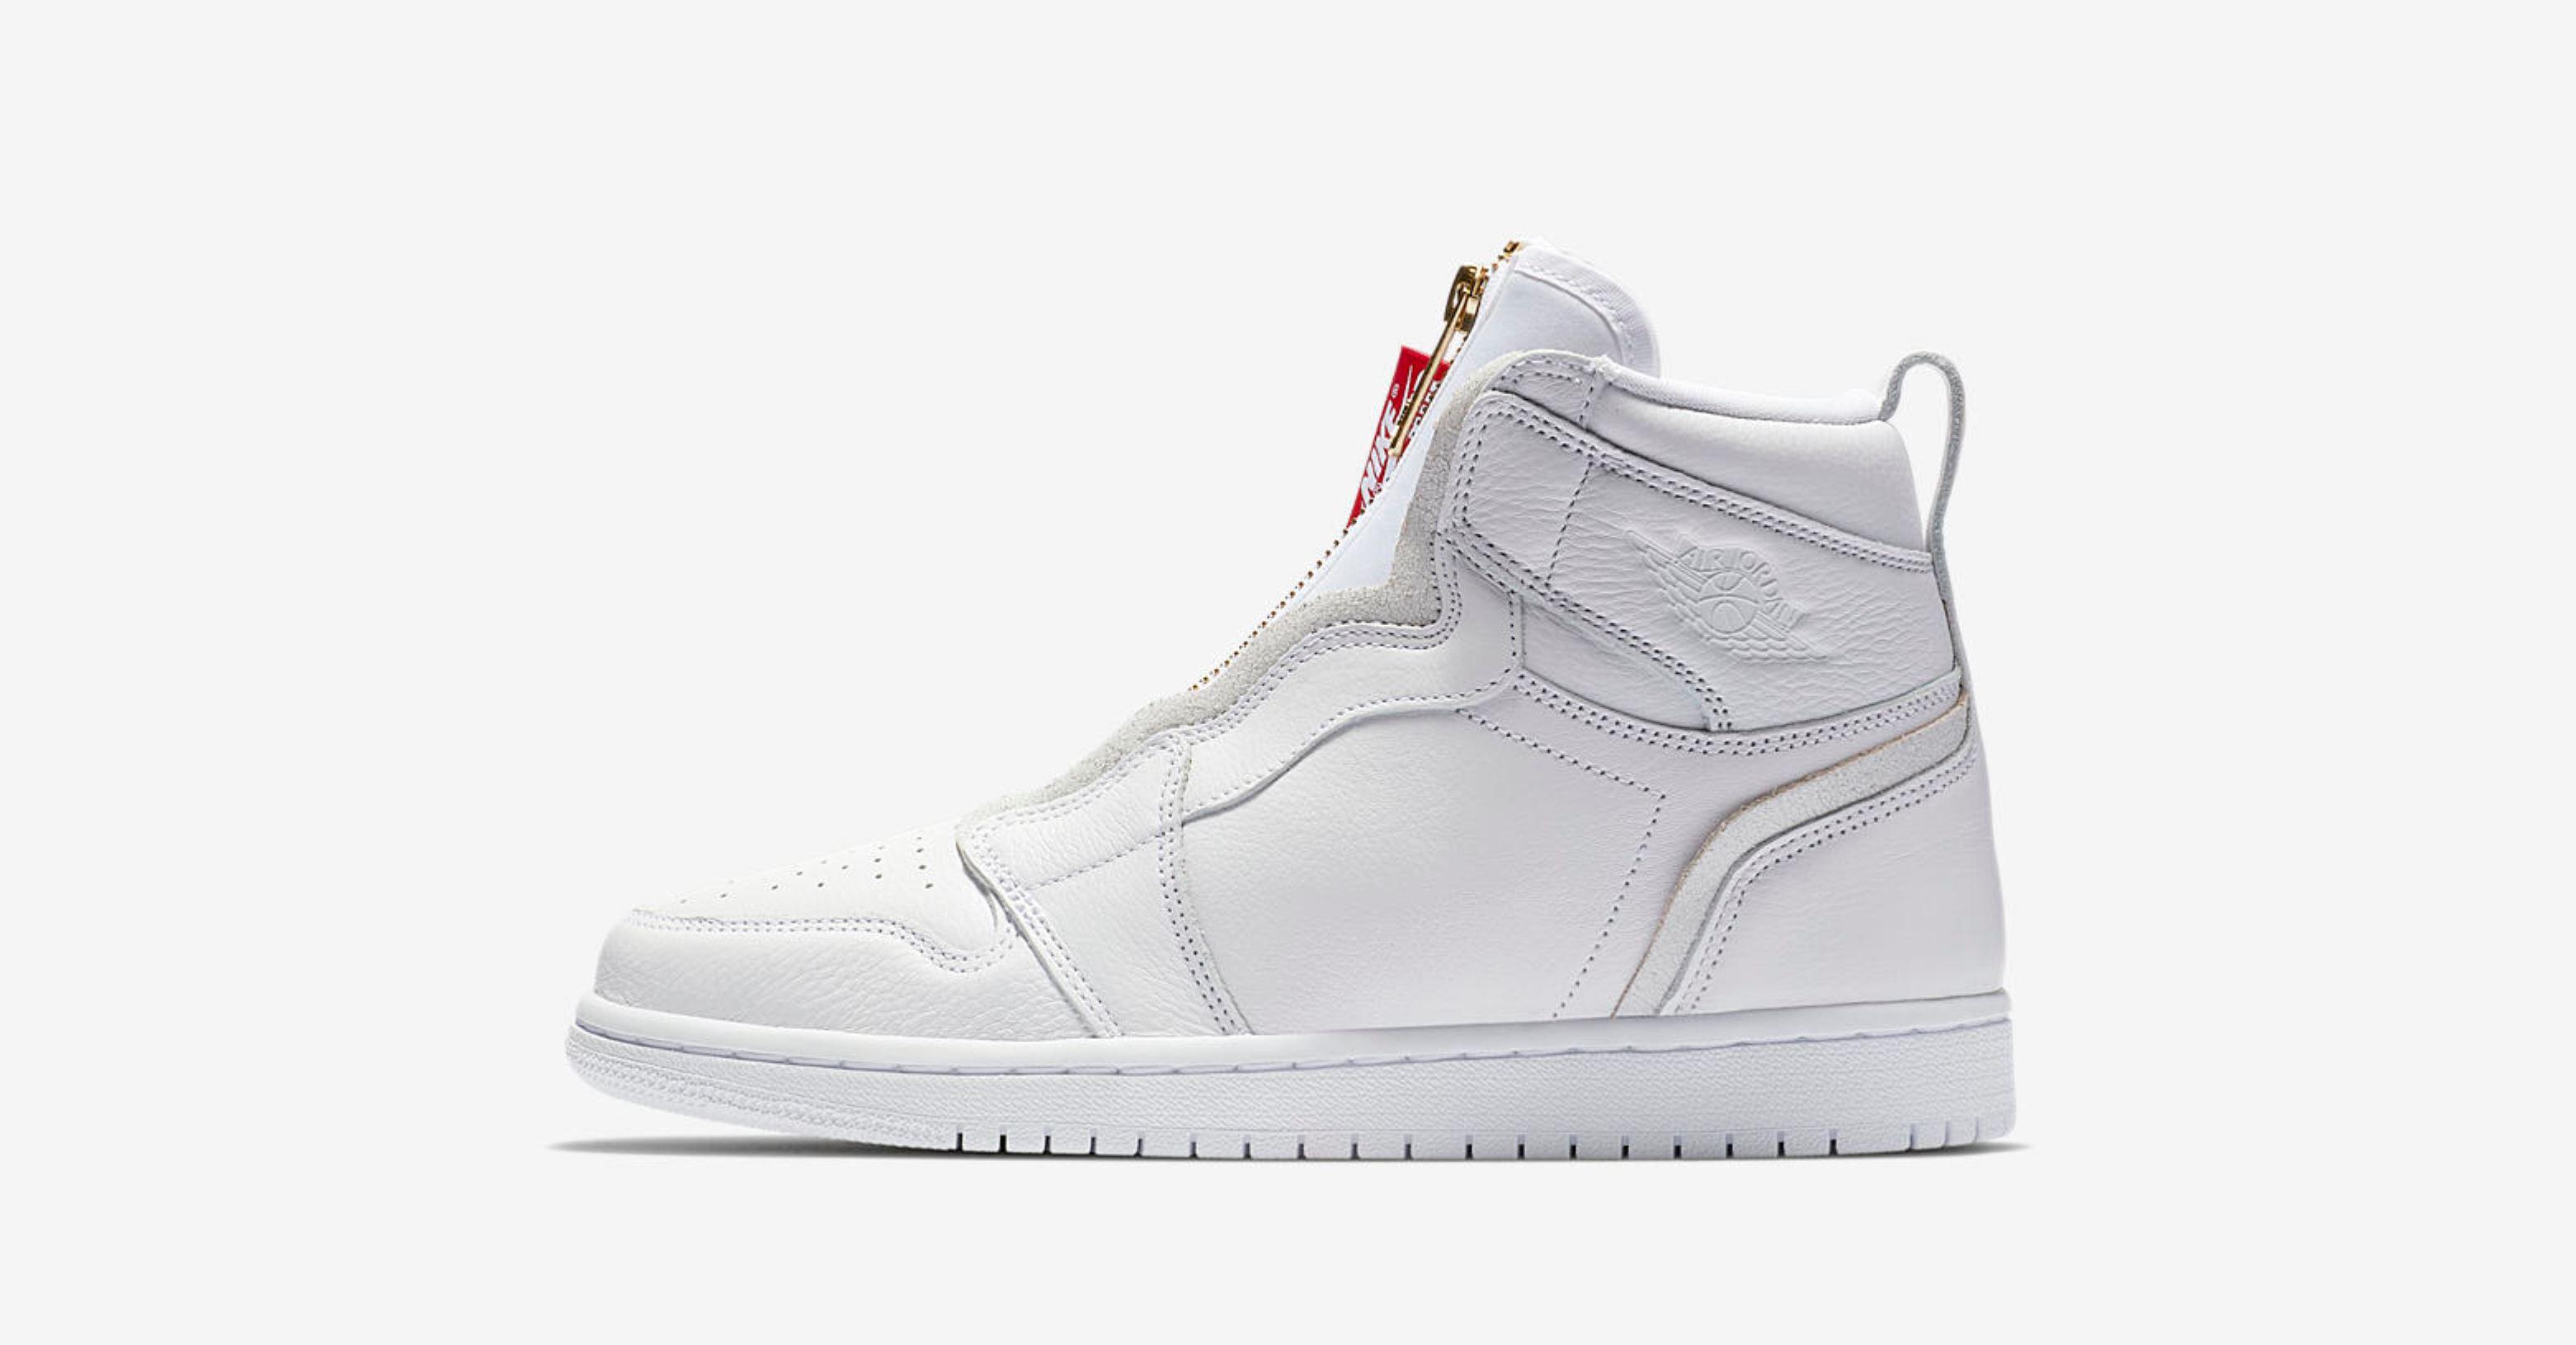 womens air jordan 1 high zip white